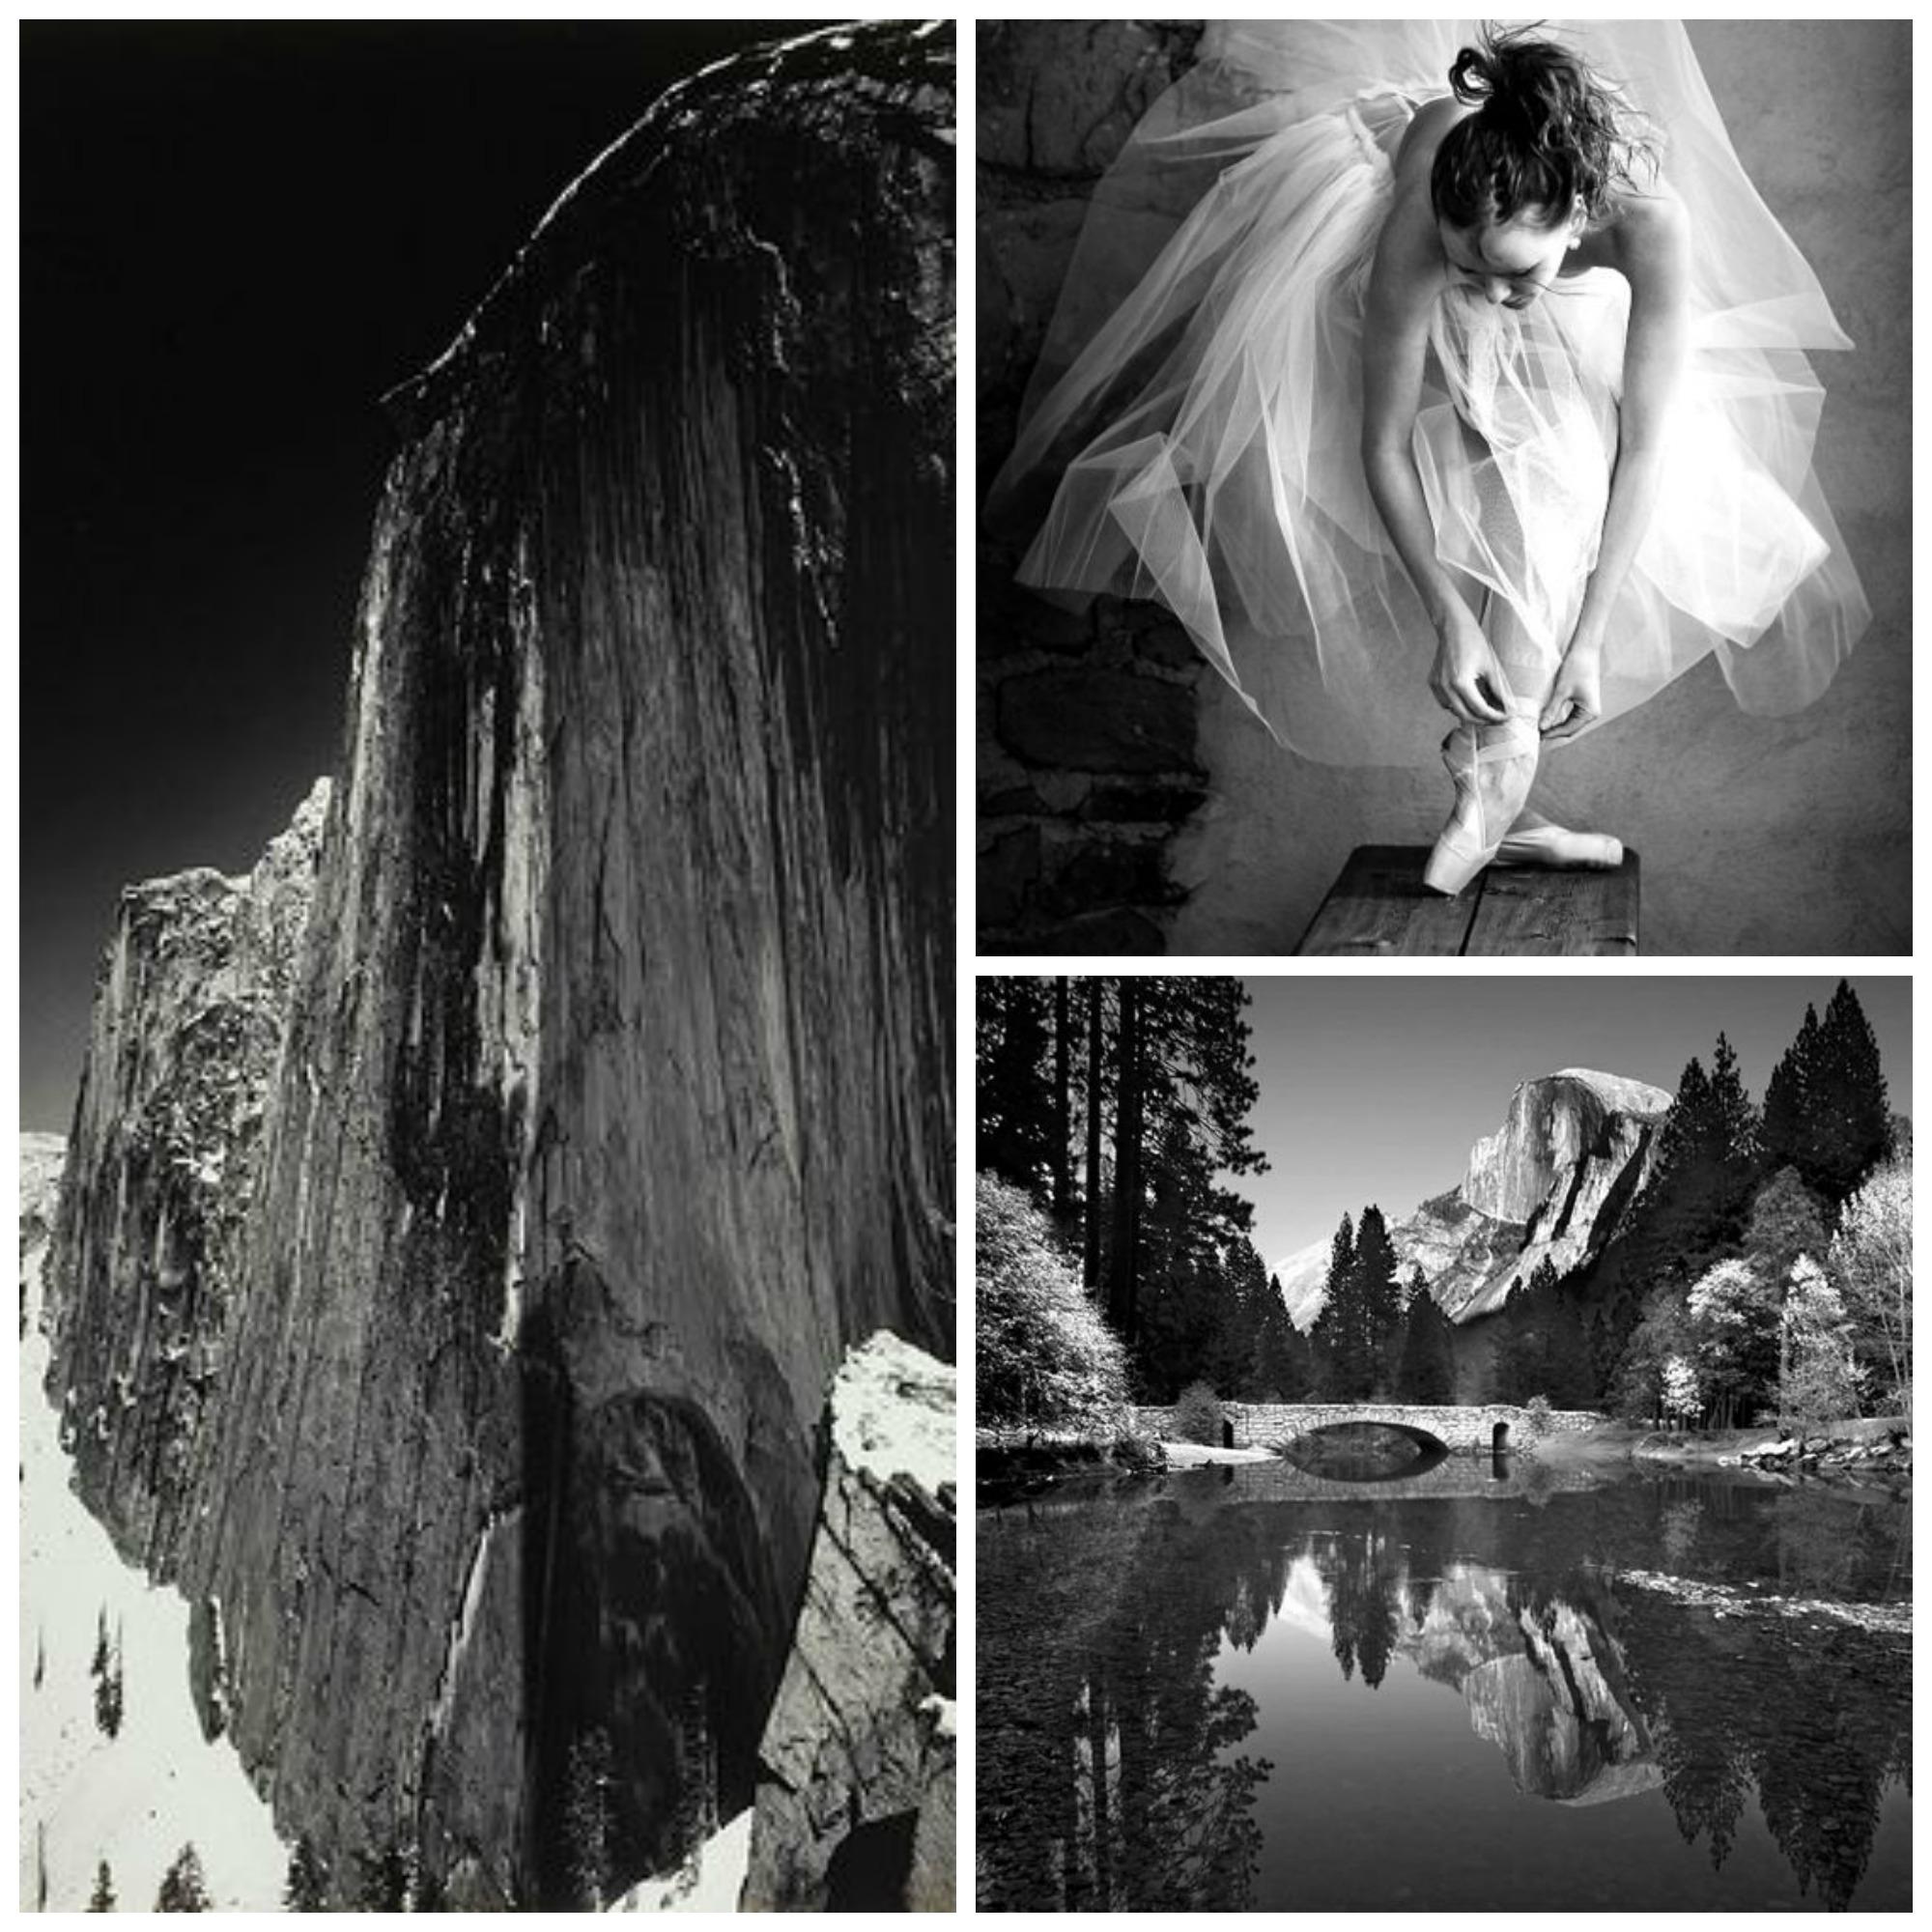 Ansel Adams collage 2